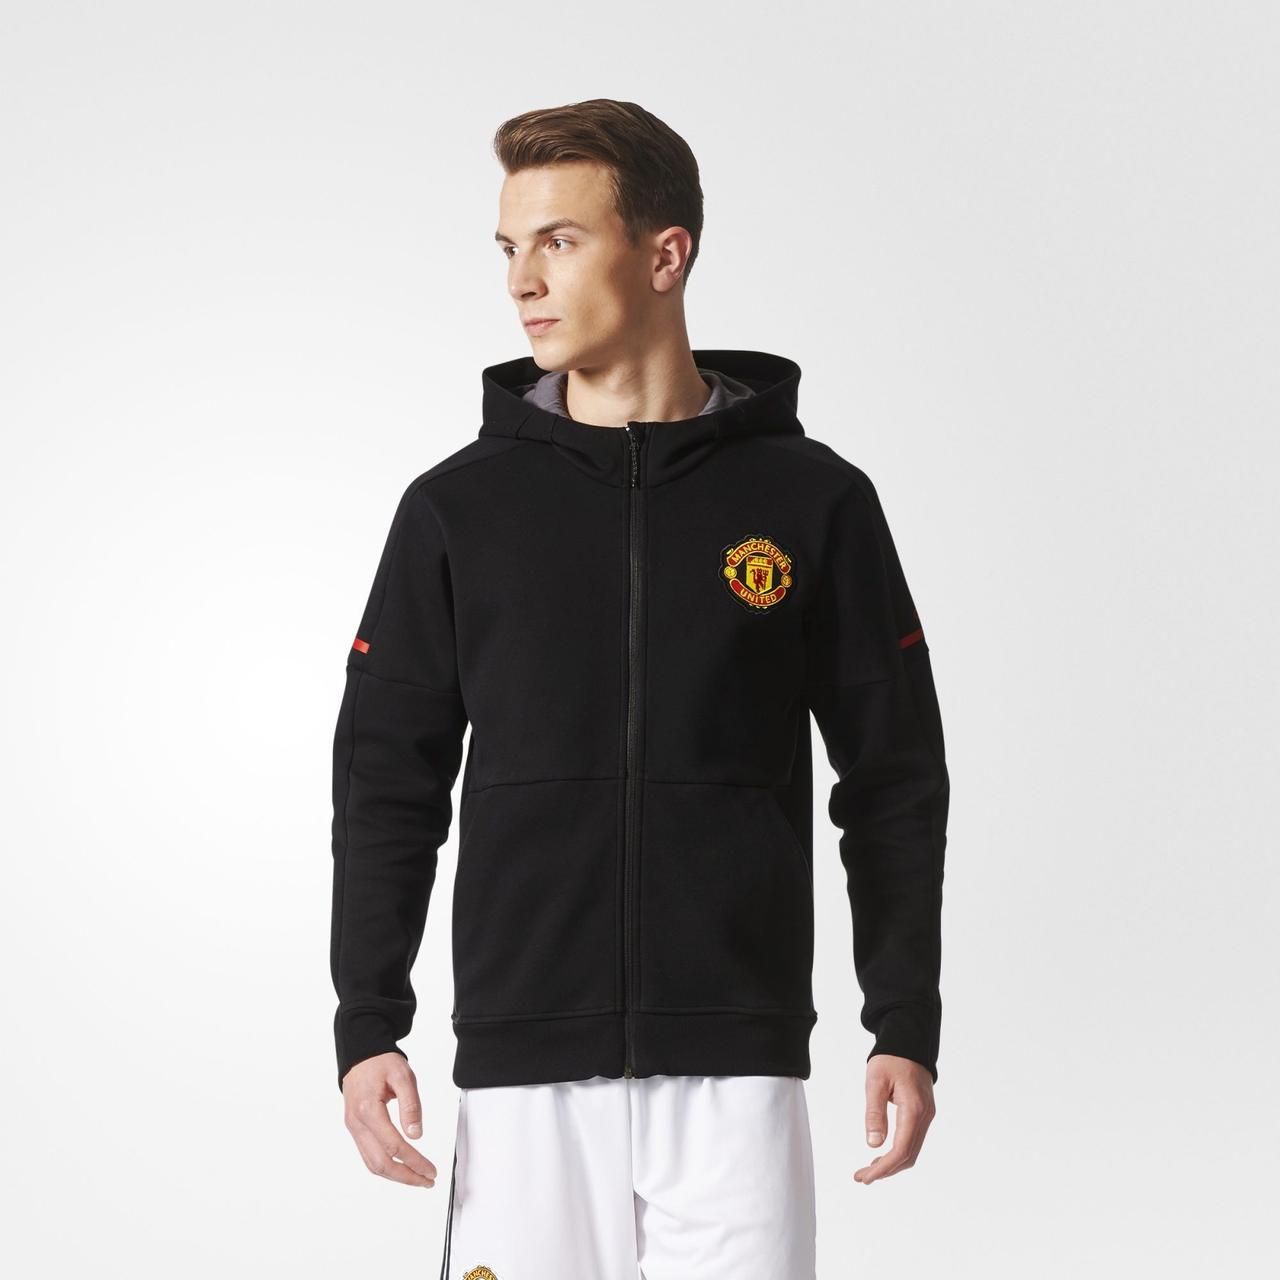 Мужская толстовка Adidas Performance Manchester United Anthem Squad (Артикул: BQ2234)